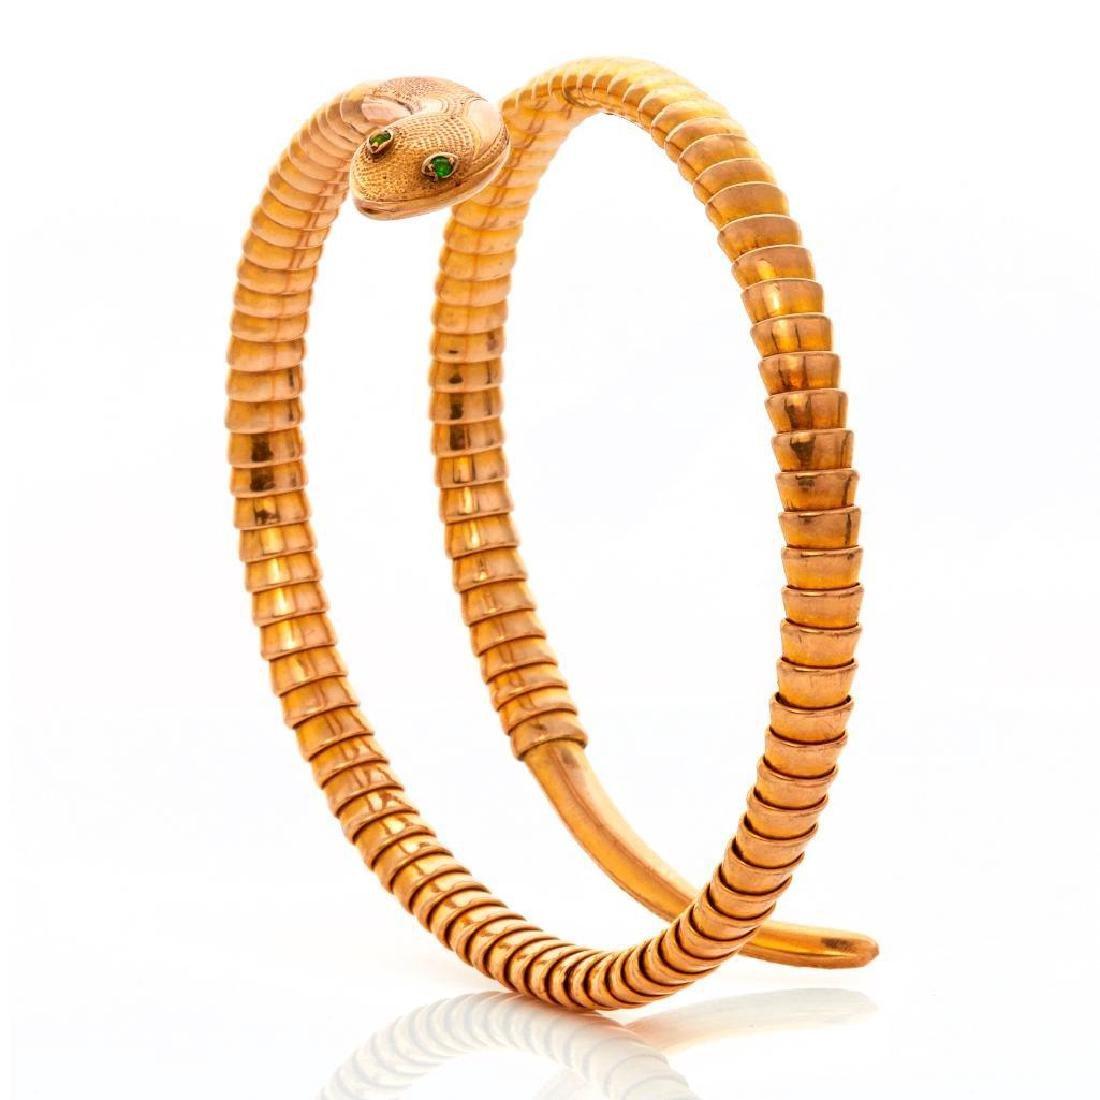 9k gold snake bracelet with sapphire eyes